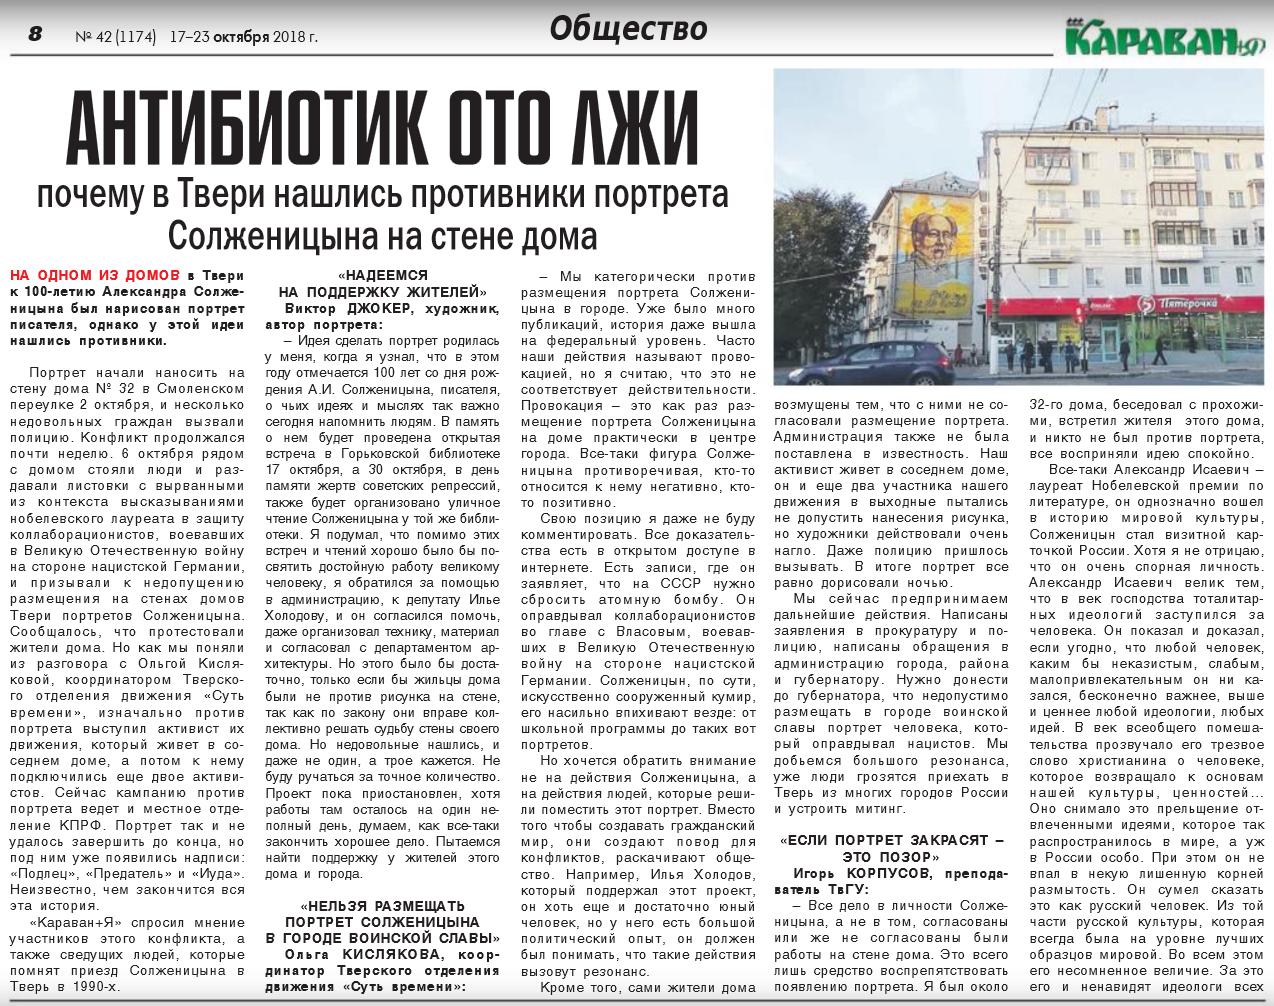 20181017-Антибиотик ото лжи. Почему в Твери нашлись противники портрета Солженицына на стене дома-с08